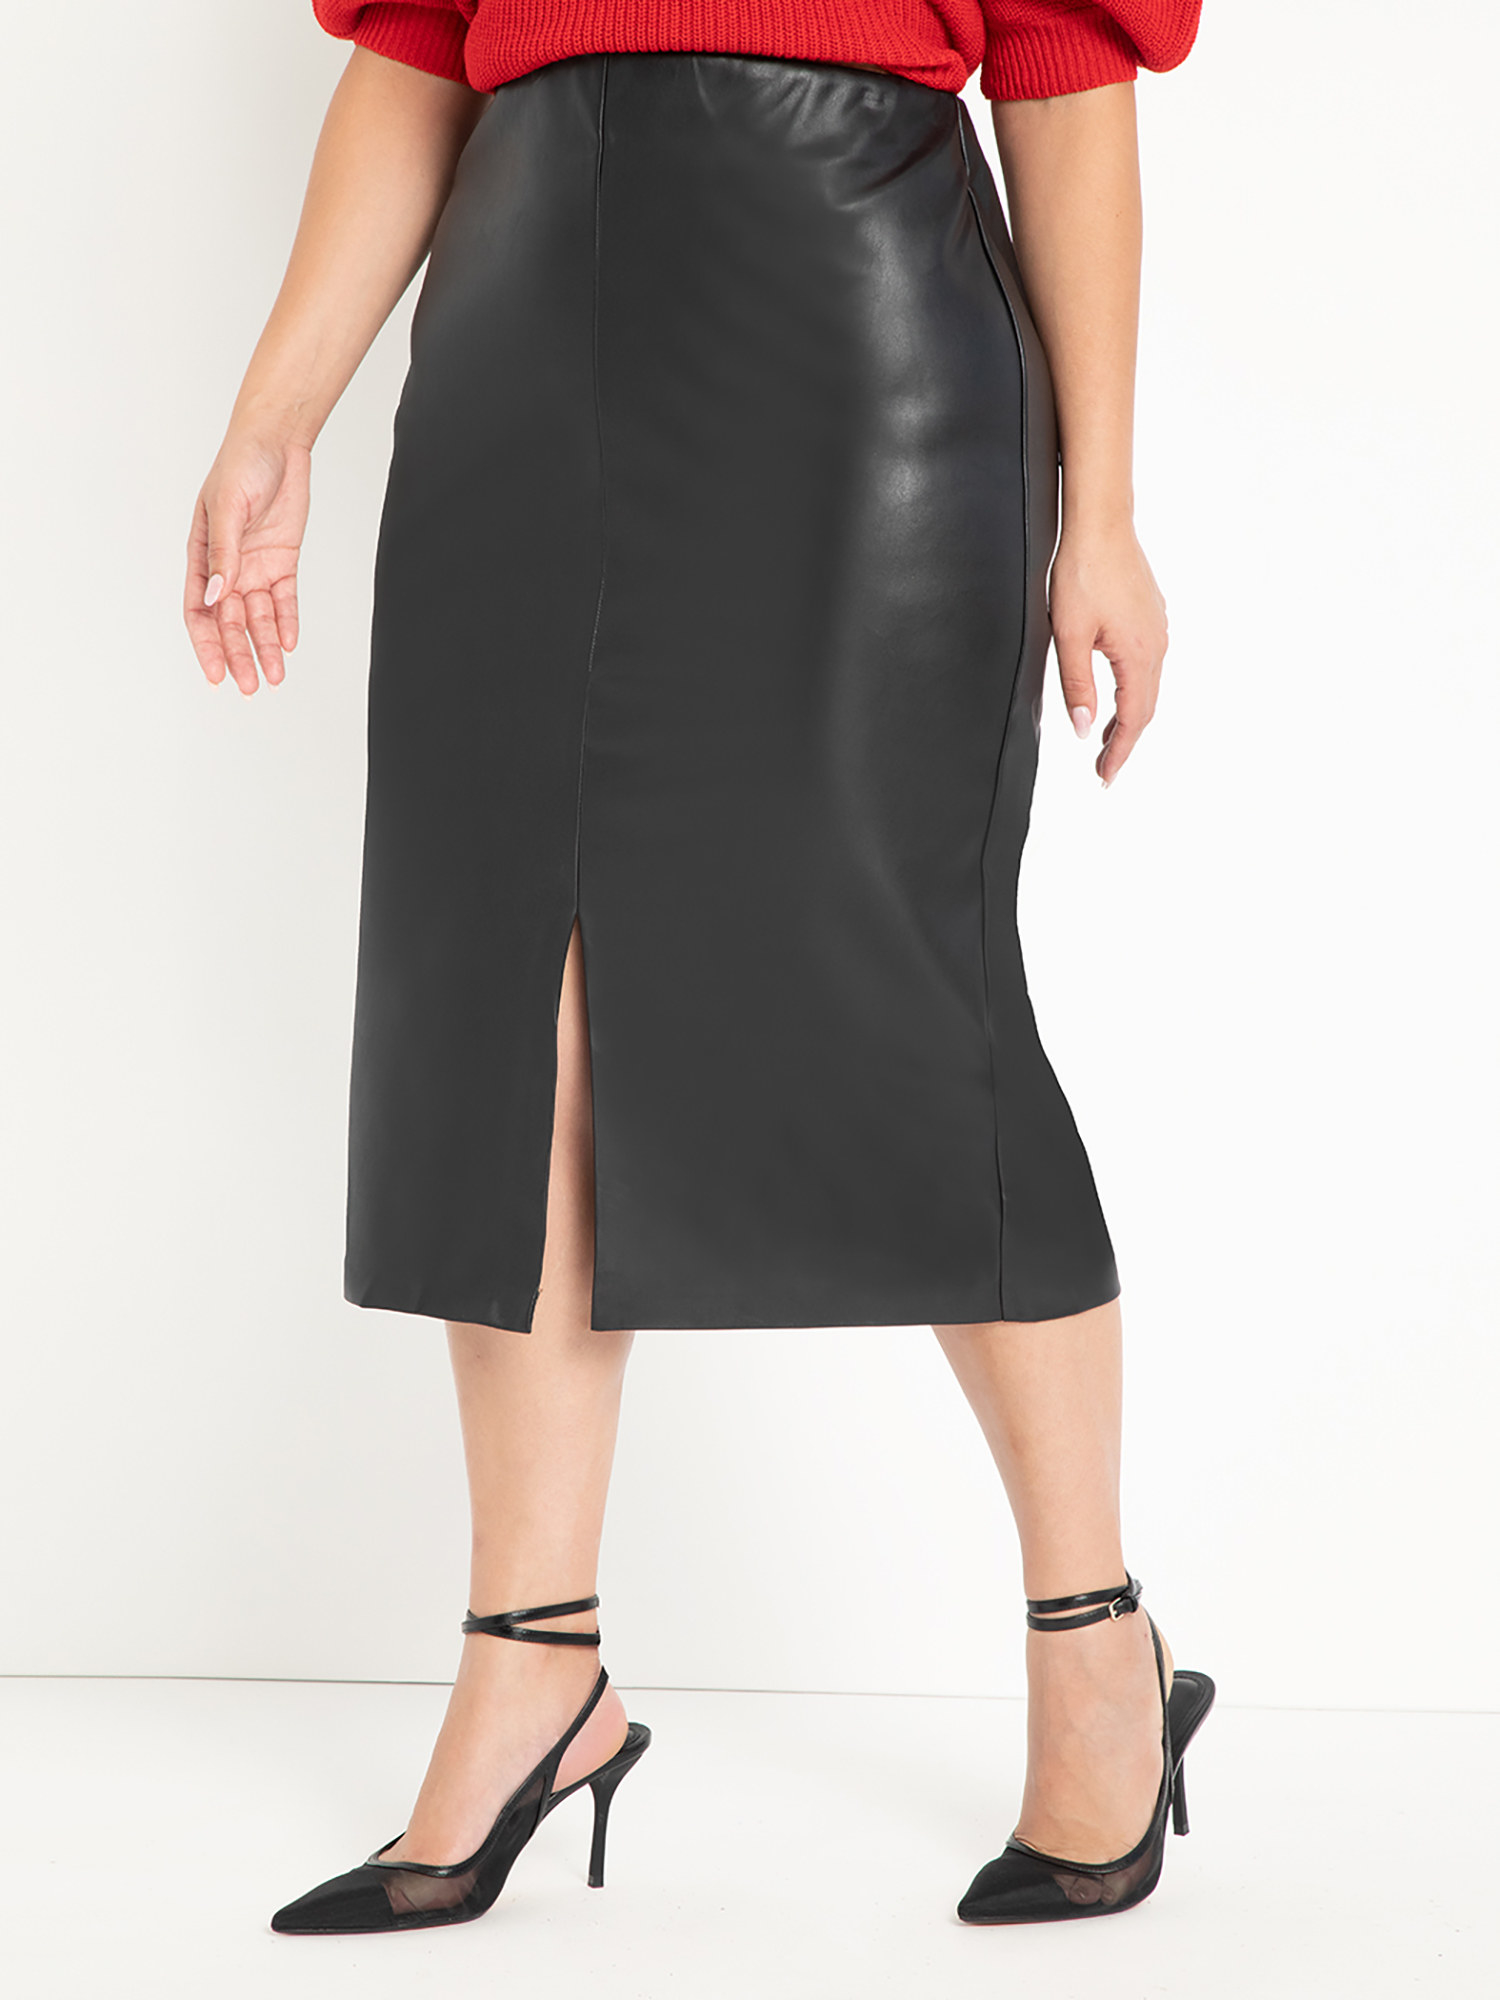 Model wearing faux leather skirt and kitten heels